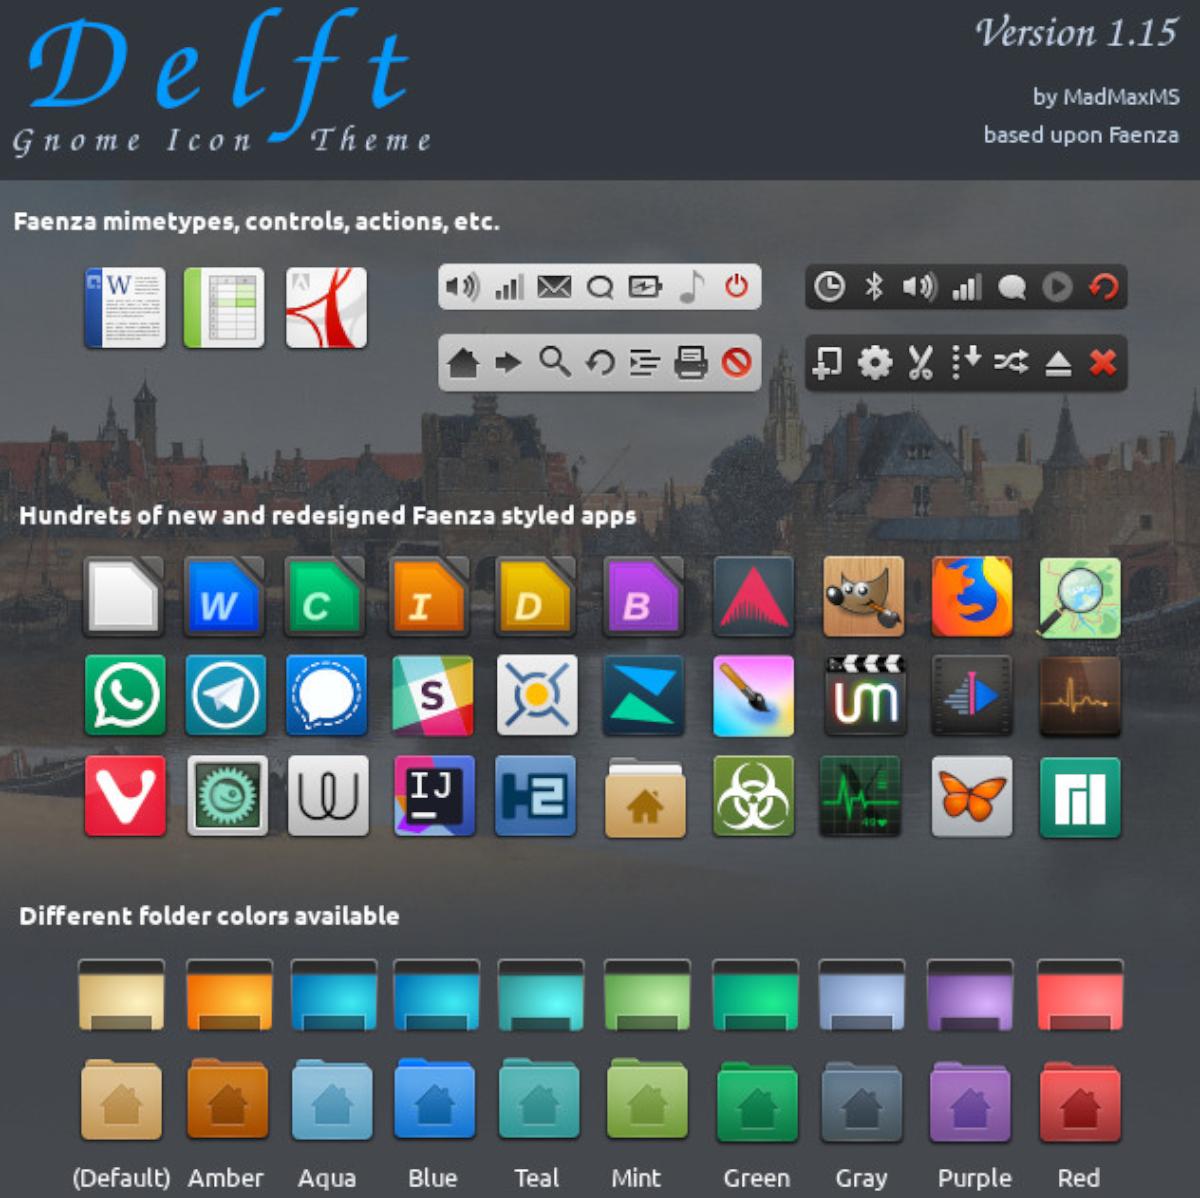 Delft ikon theme